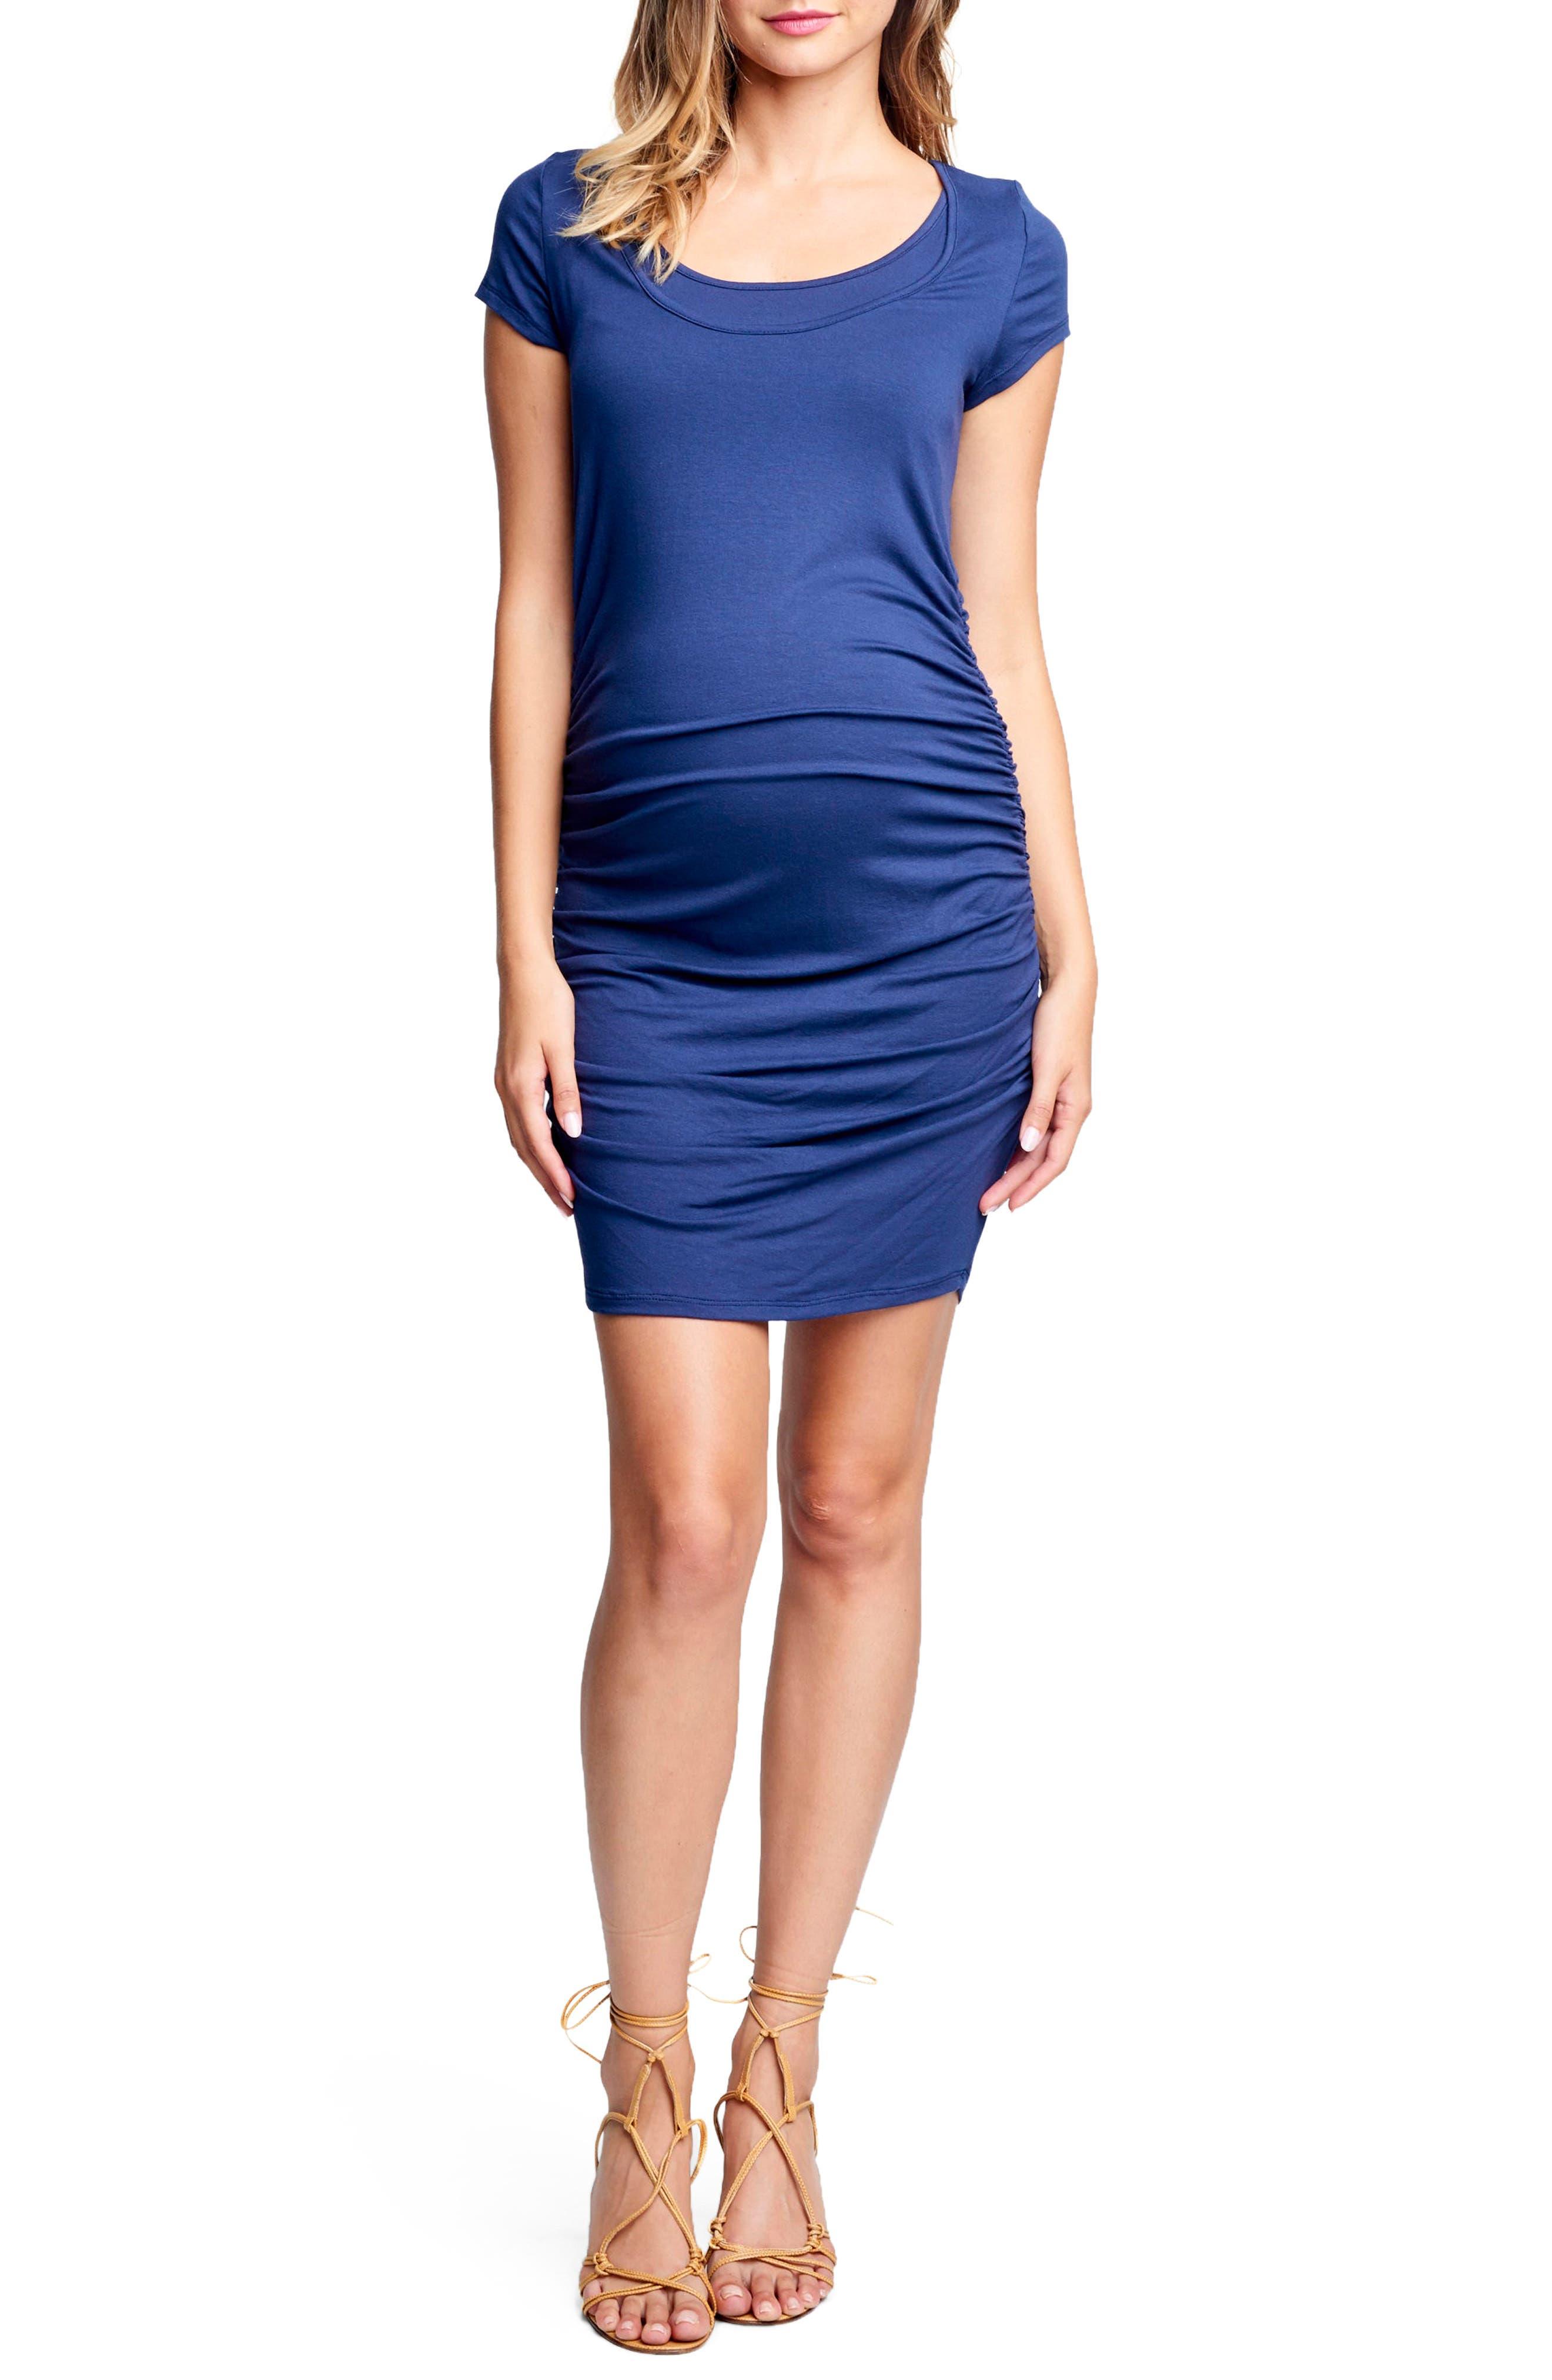 Maternal America Short Sleeve Ruched Maternity/nursing Dress, Blue